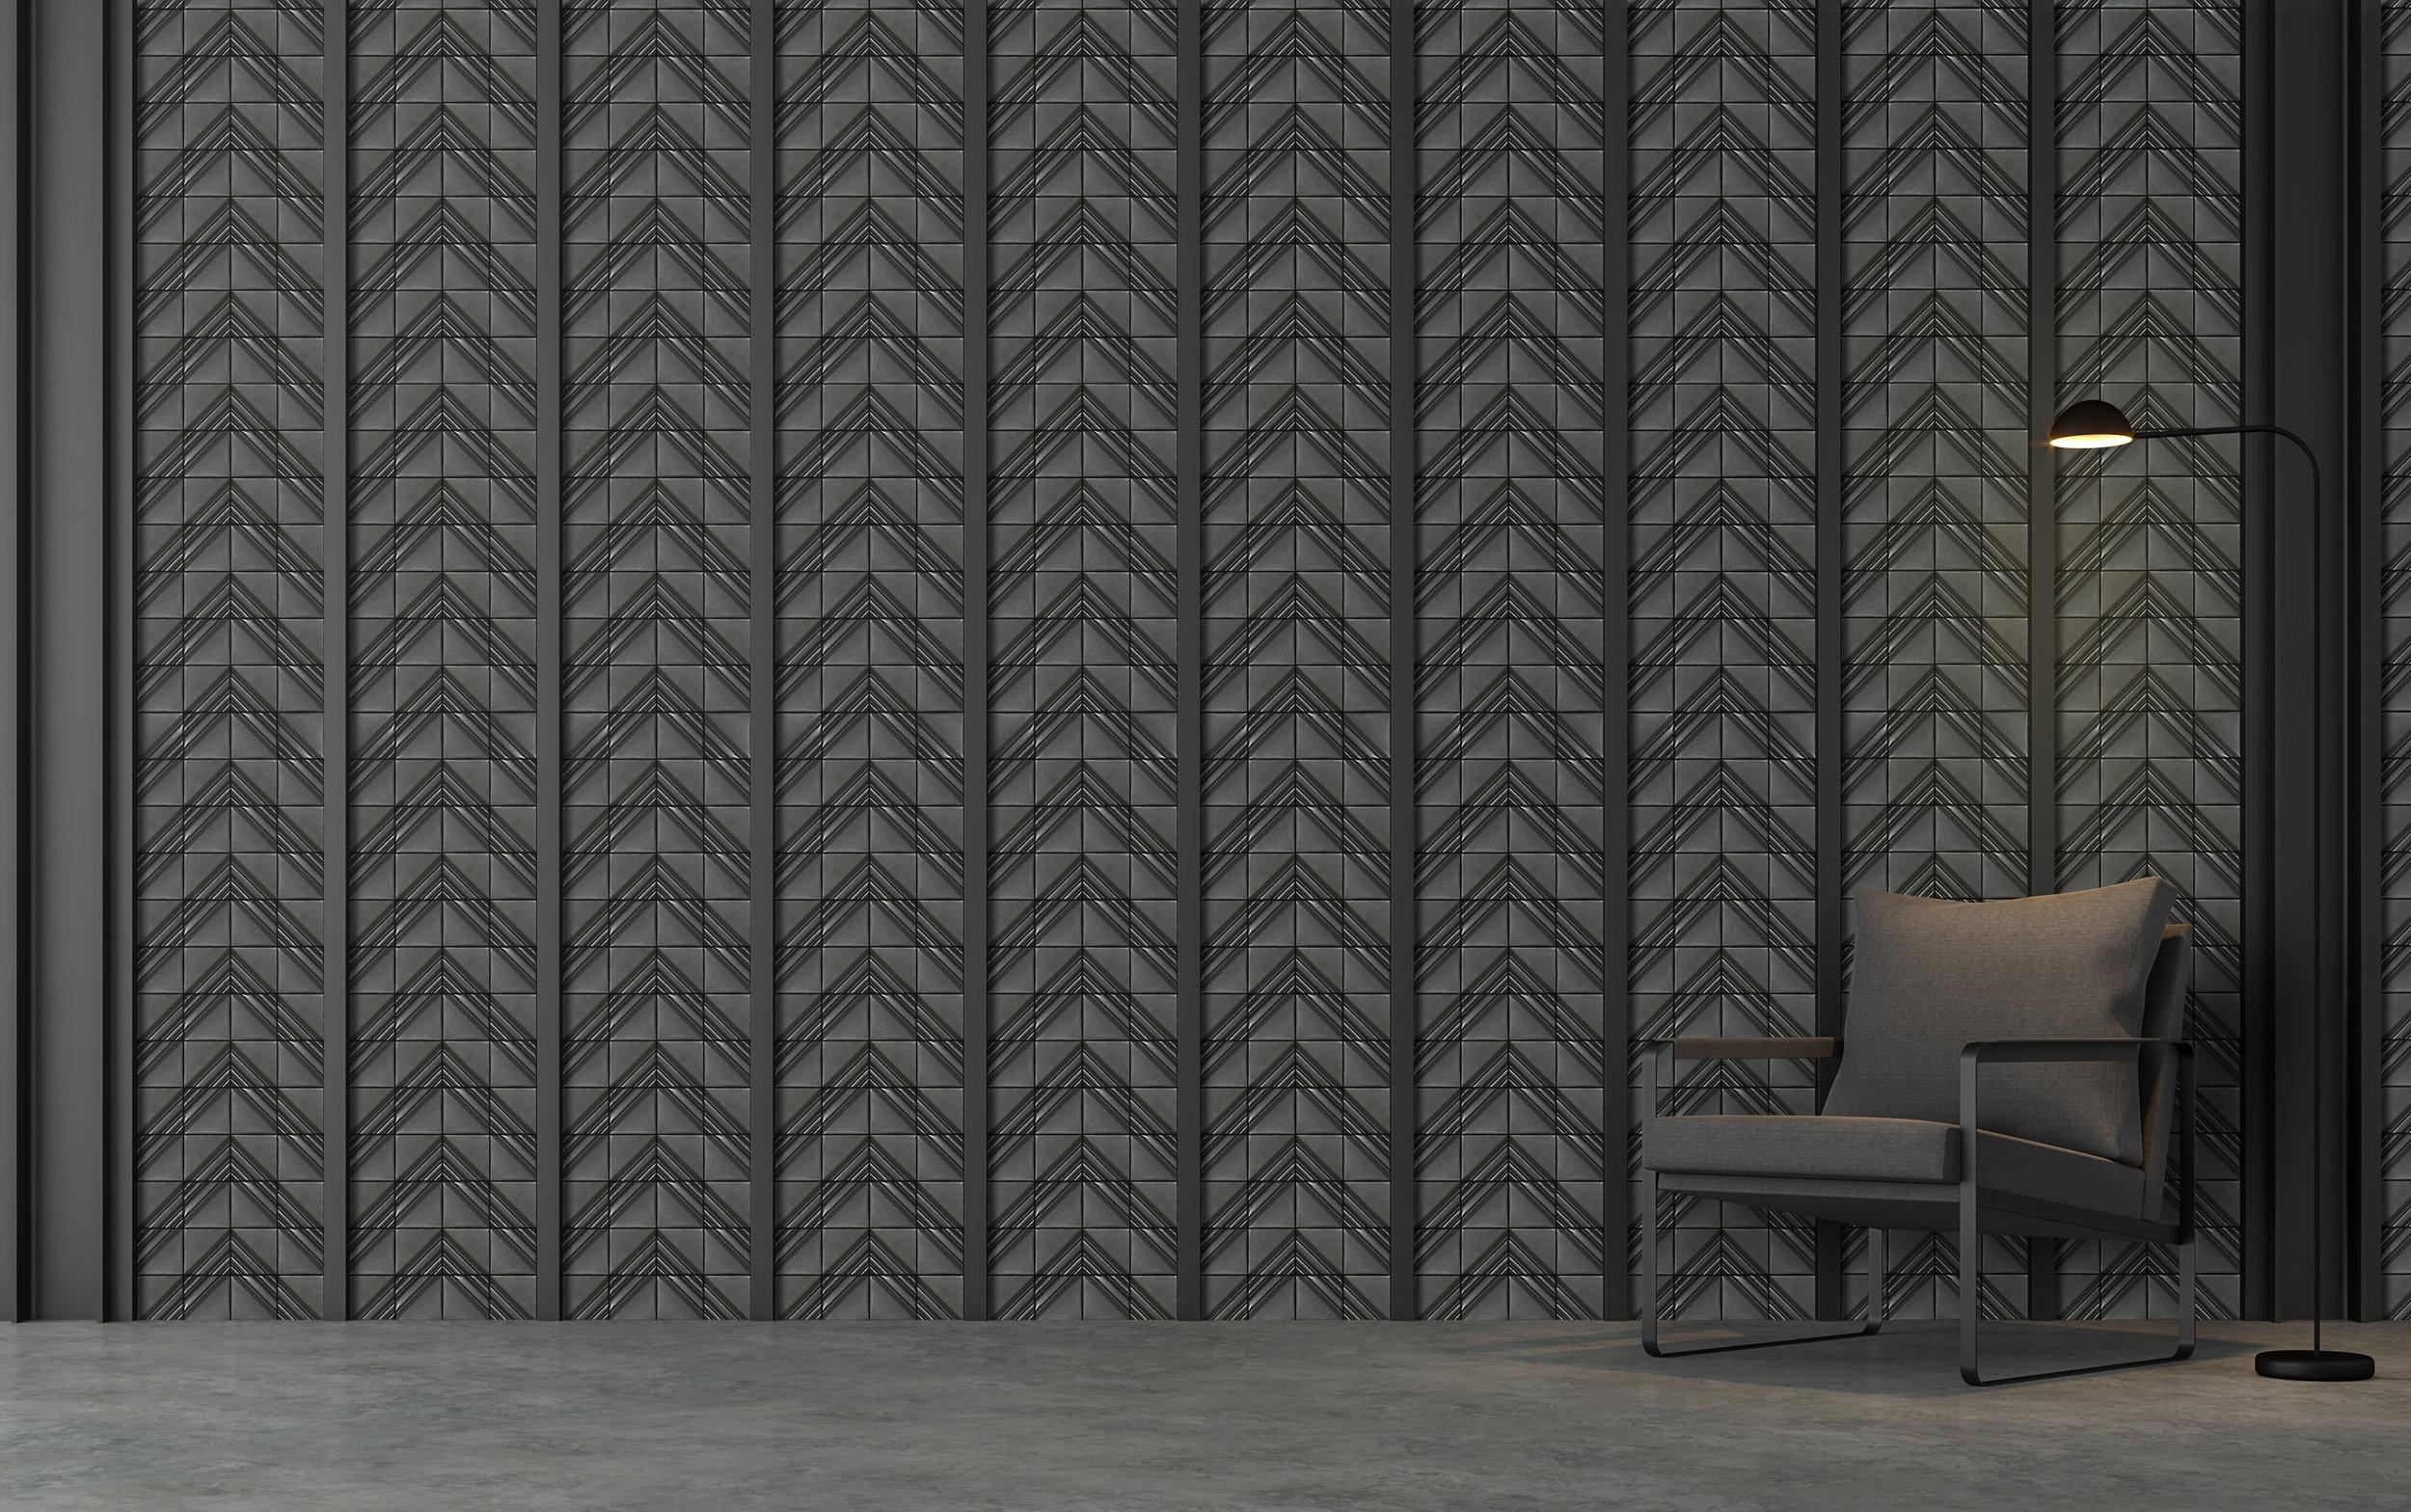 RF442-Shimmer Gray as the wall tiles